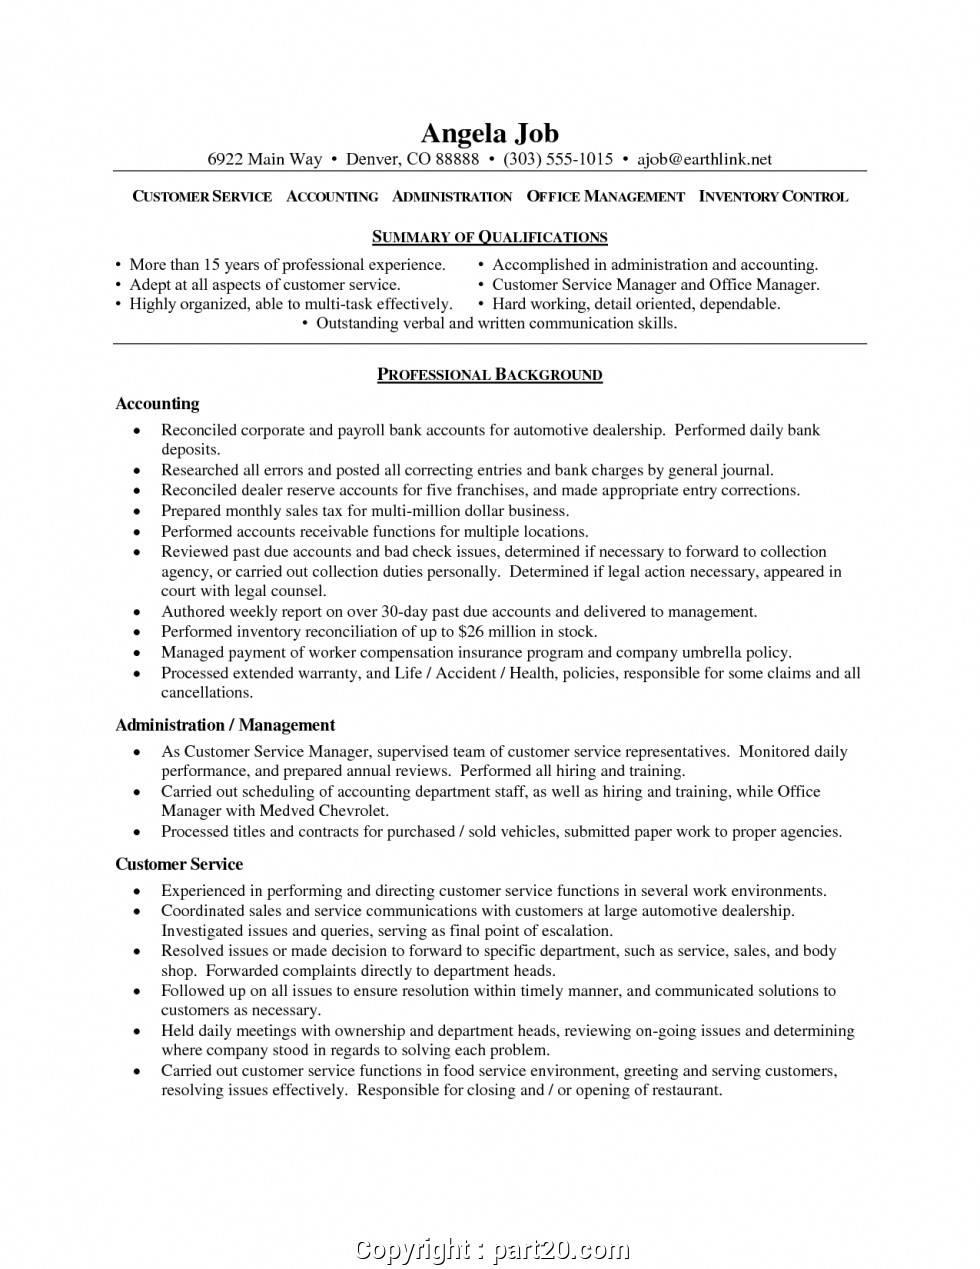 Sample Customer Service Resume Australia